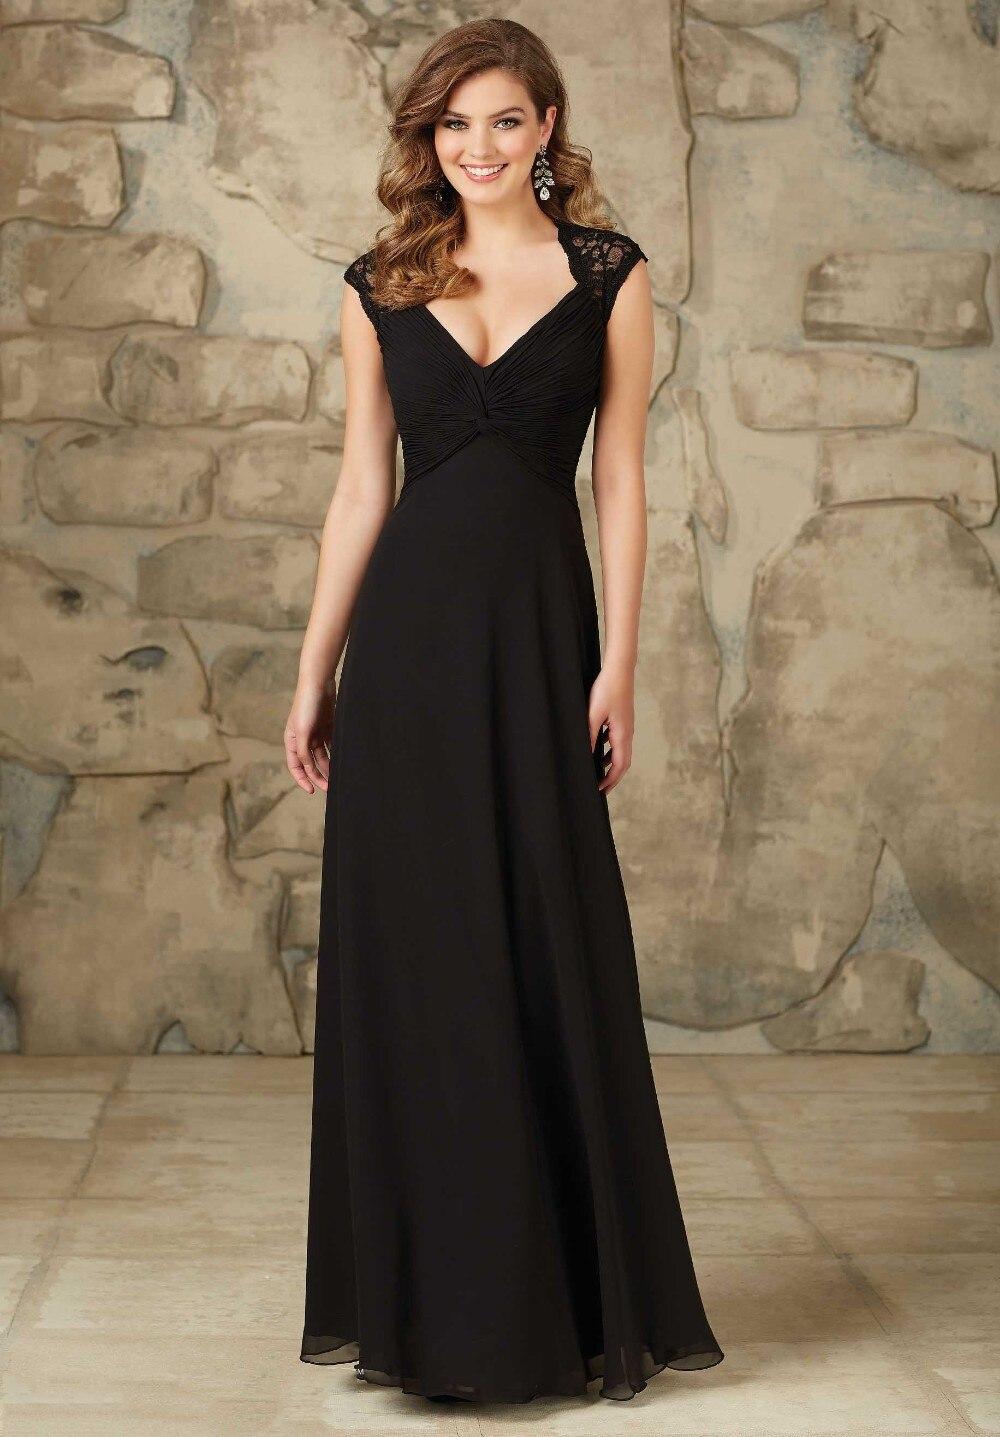 Black dress bridesmaid - Maternity Formal Wedding Party Dress Long Chiffon Black Lace Bridesmaid Dresses Plus Size 2017 Open Back